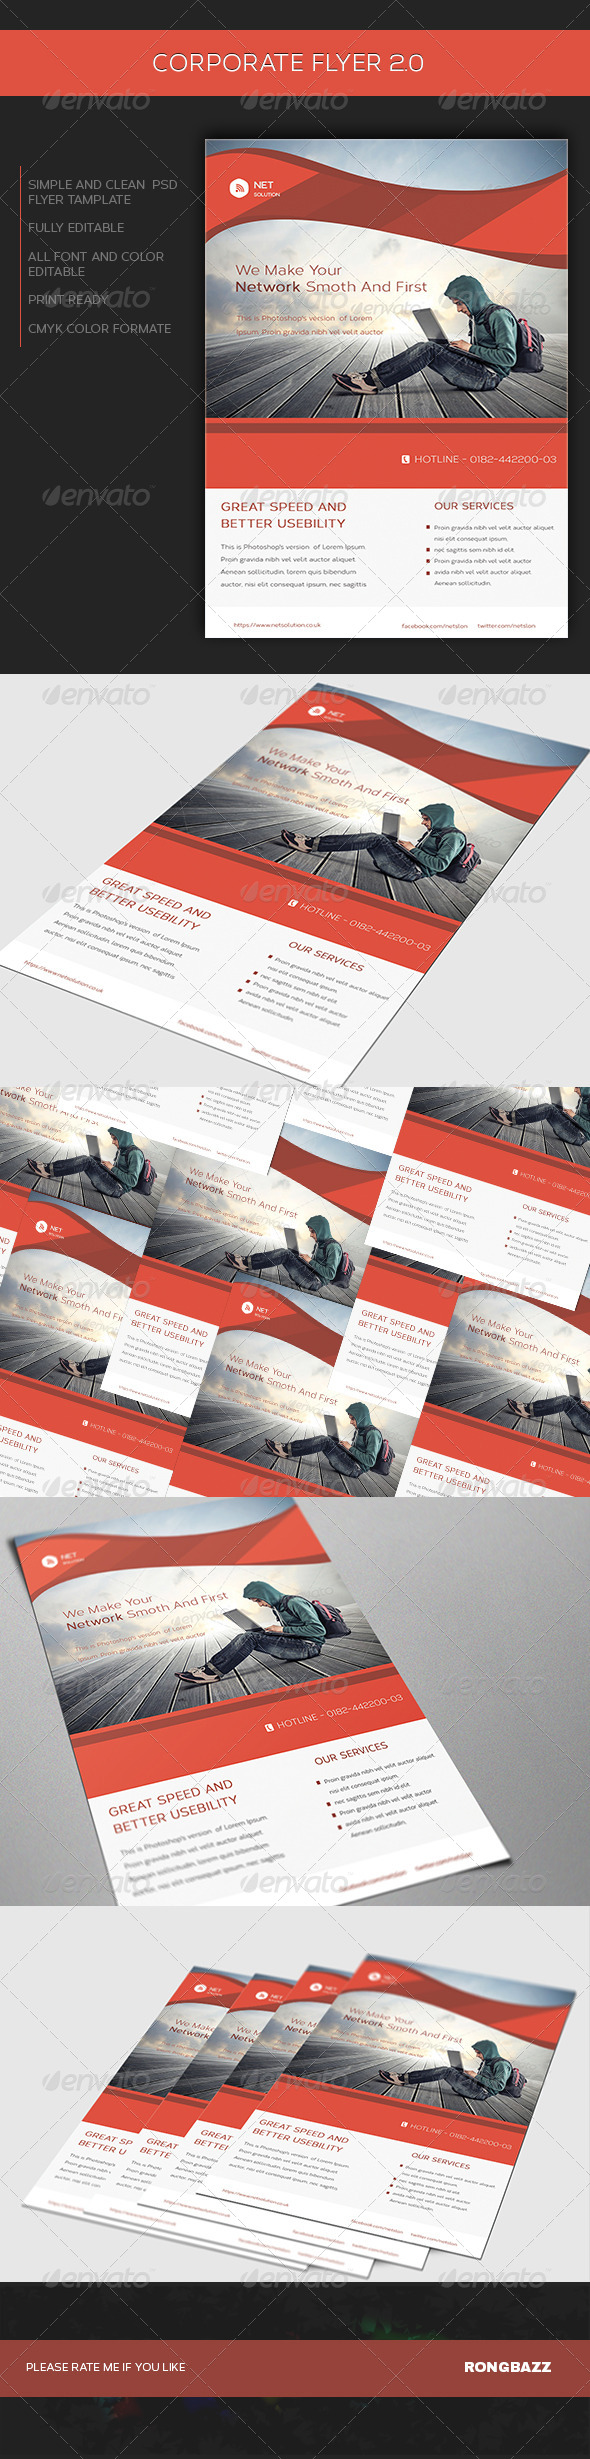 Corporate Flyer 2.0